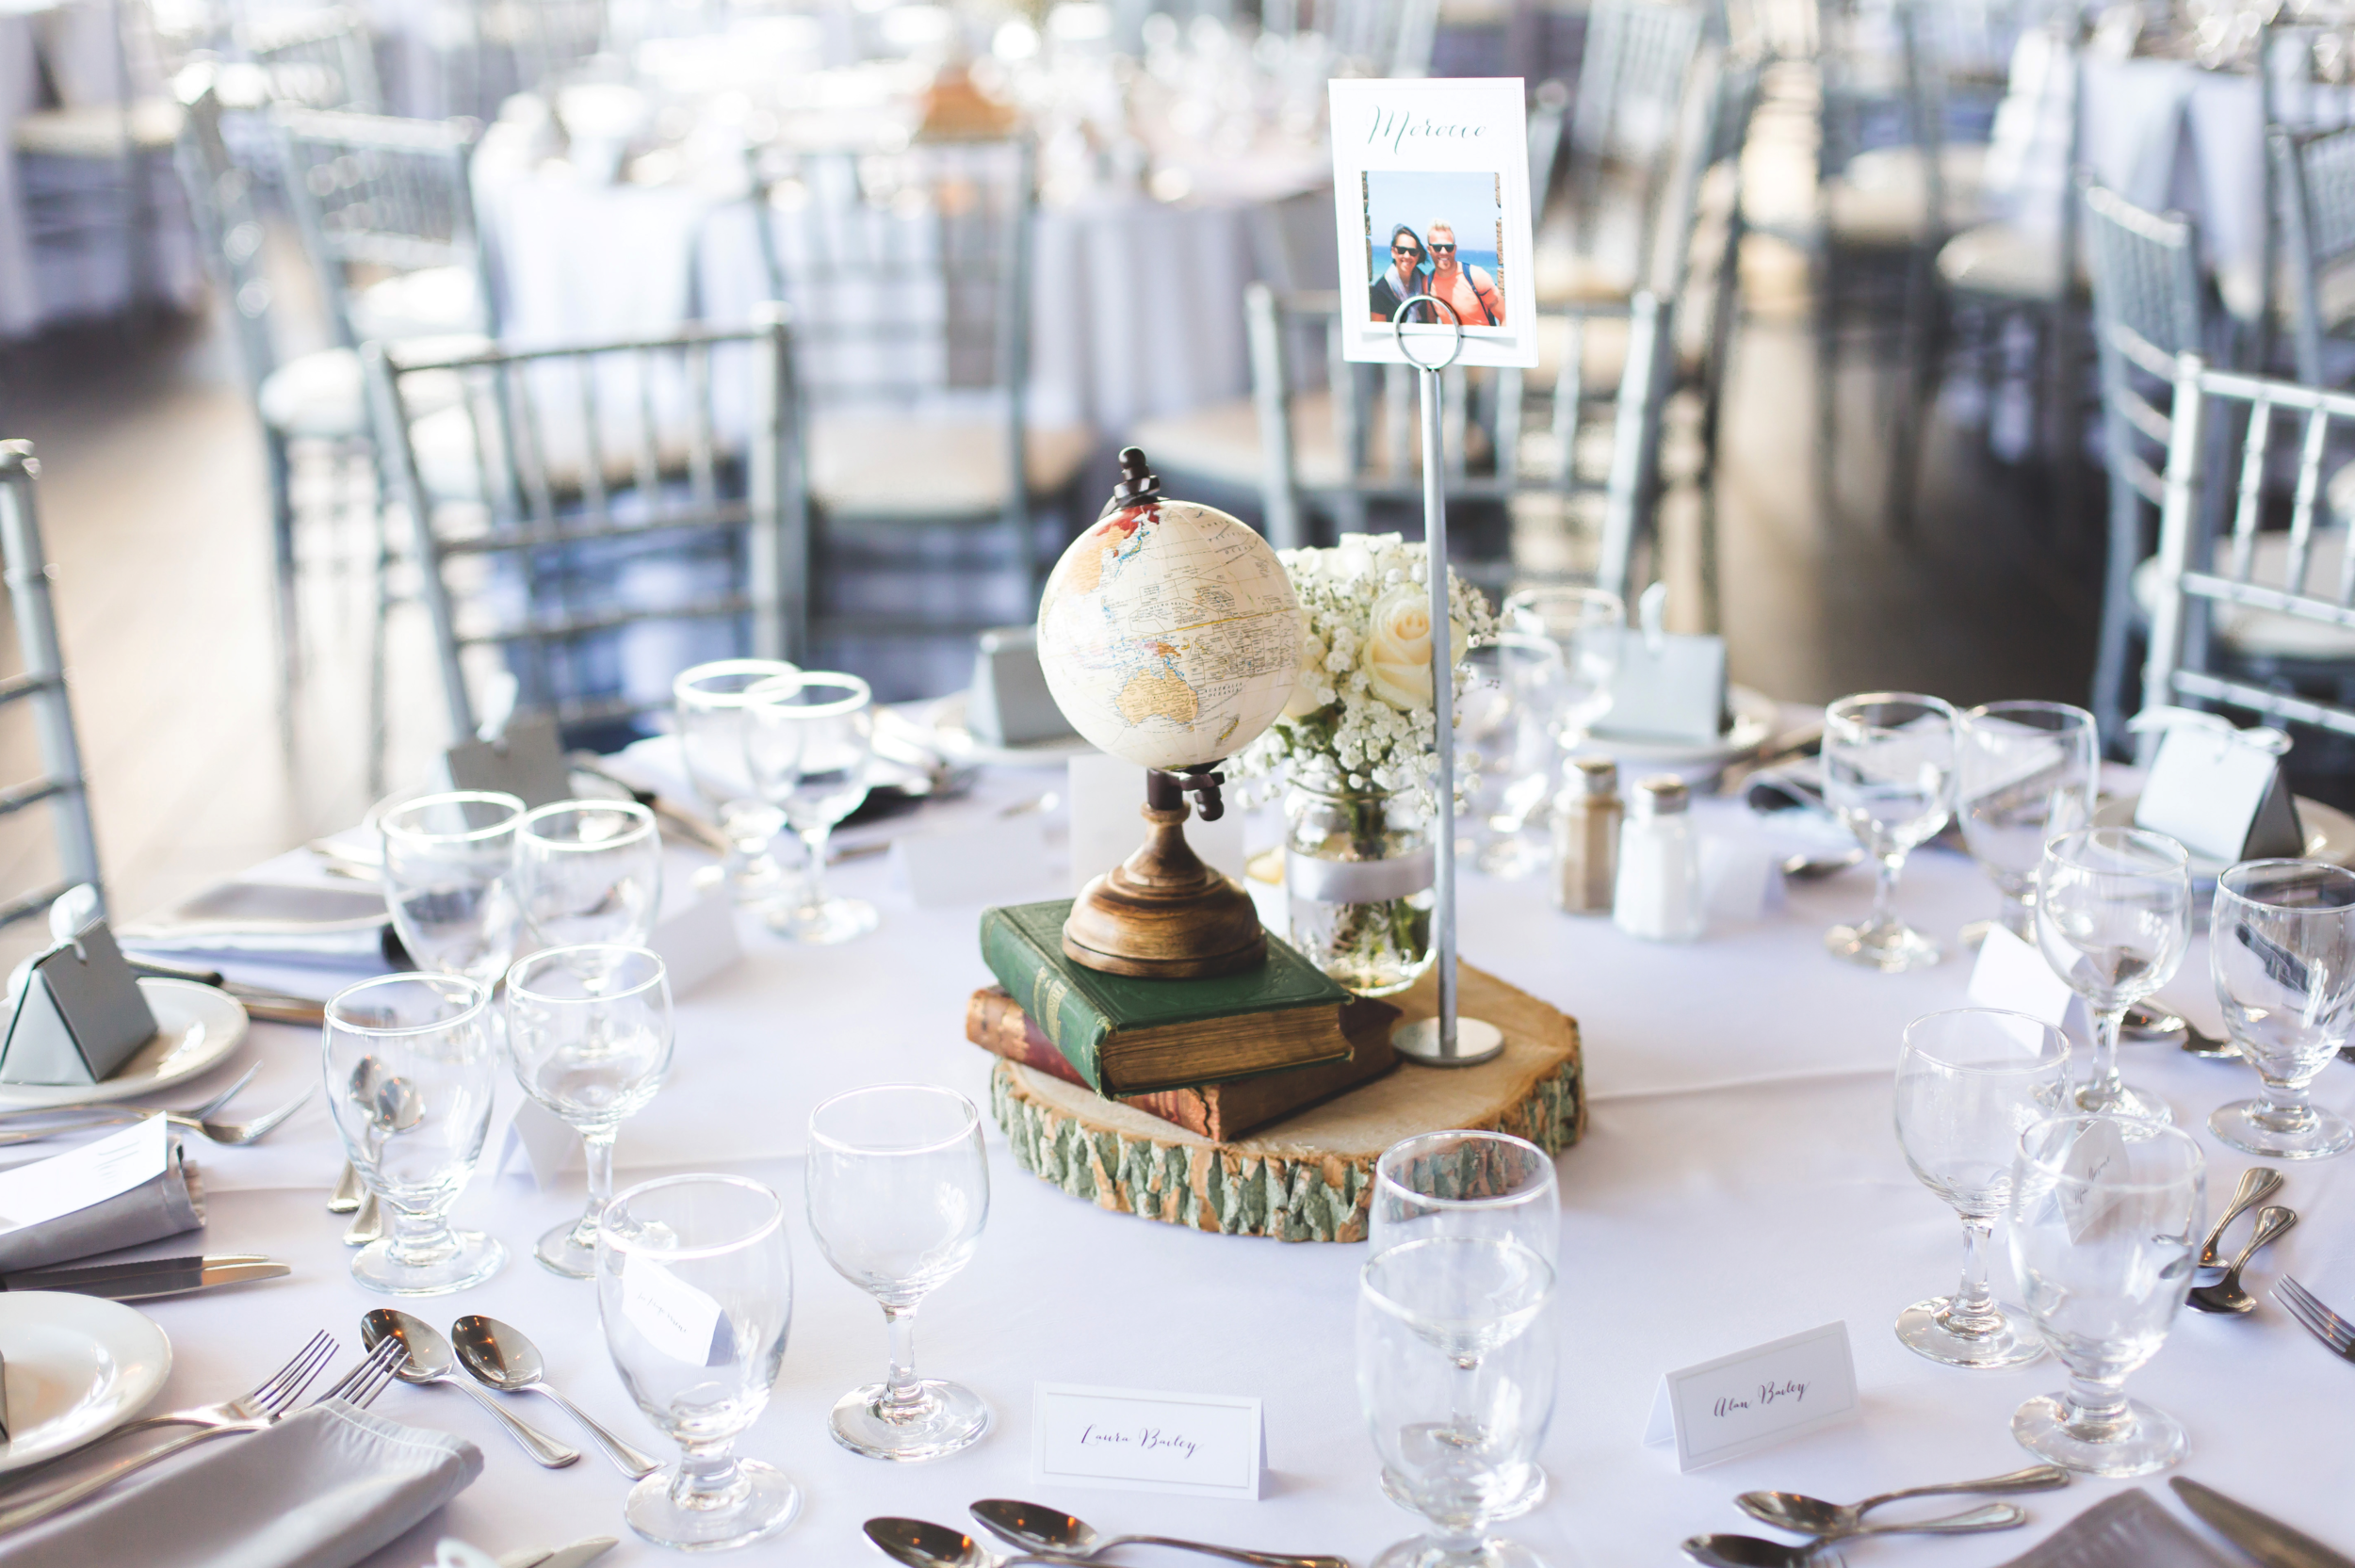 Wedding-Harbour-Banquet-Center-Oakville-Photographer-Wedding-Hamilton-Saint-James-Espresso-Downtown-HamOnt-GTA-Niagara-Toronto-Moments-by-Lauren-Photography-Photo-Image-45.png